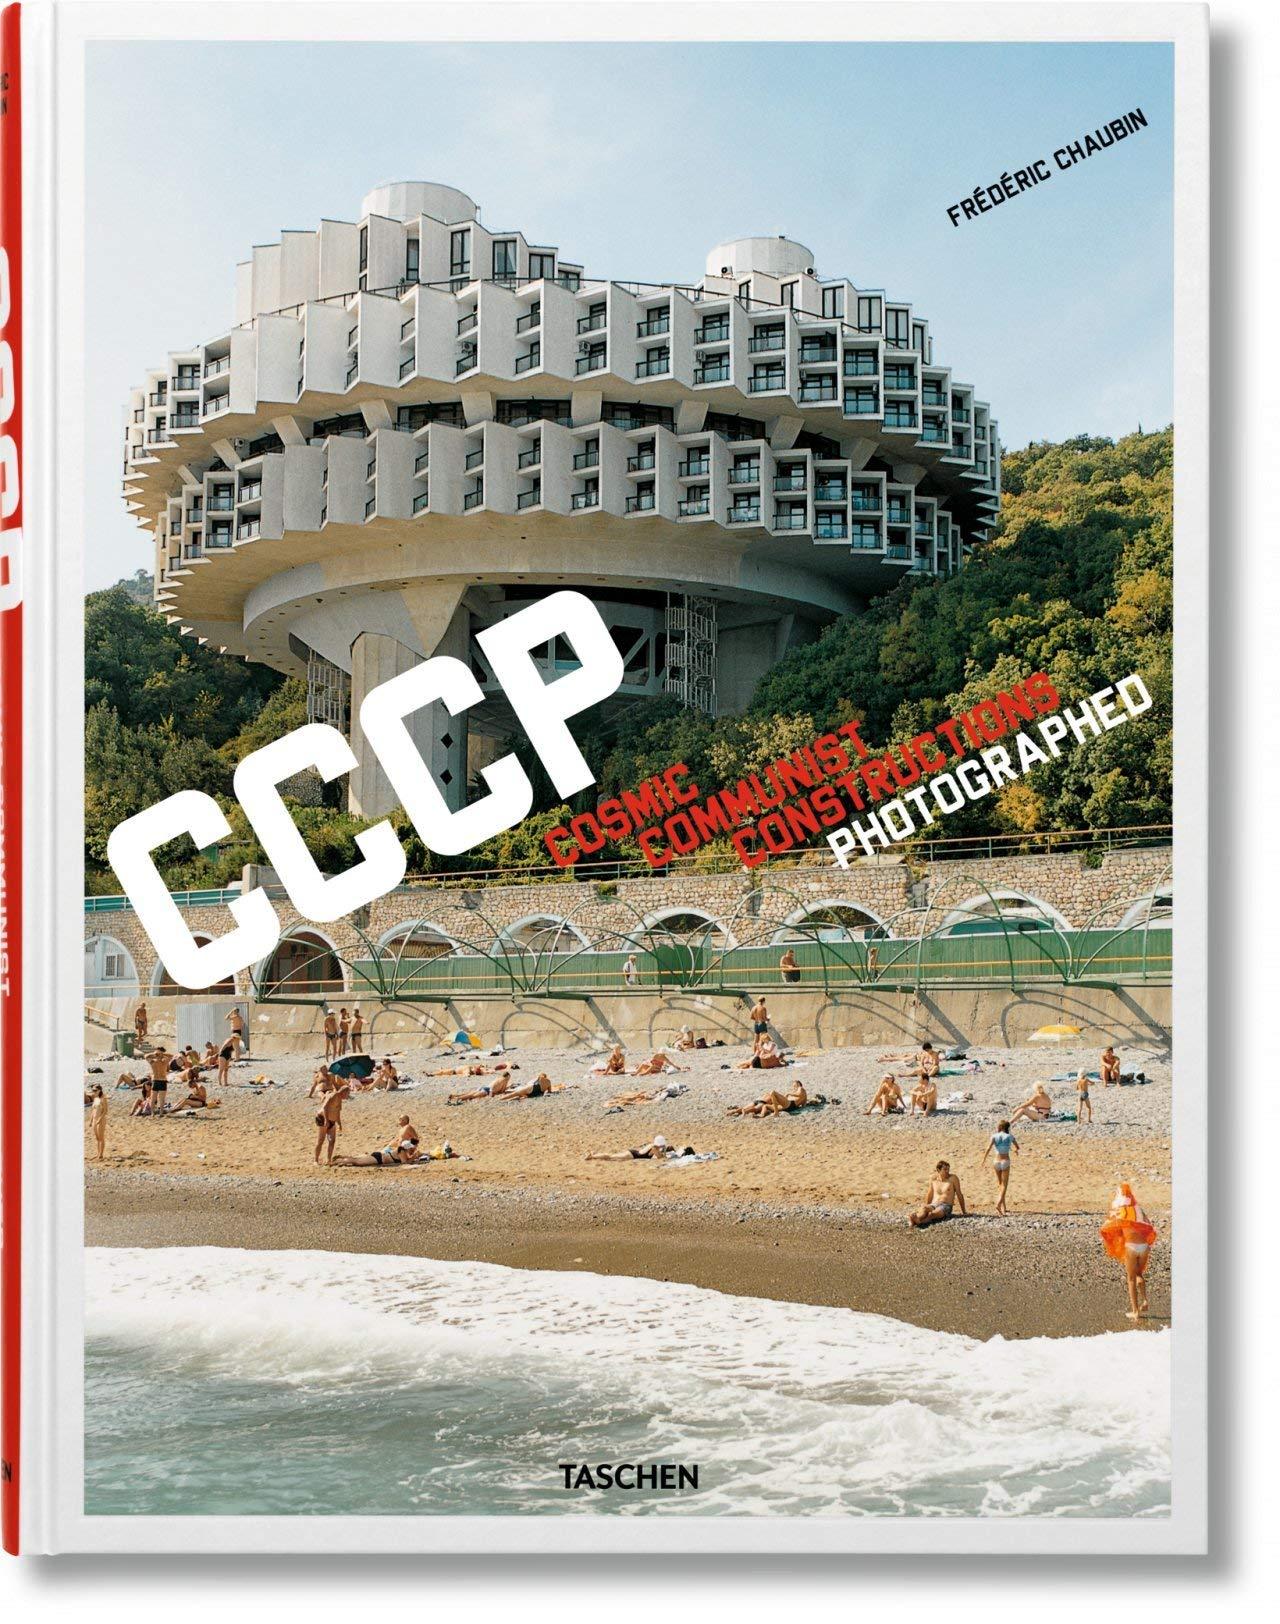 2eee8bc722d18 Frédéric Chaubin  Cosmic Communist Constructions Photographed Hardcover – 5  Feb 2011